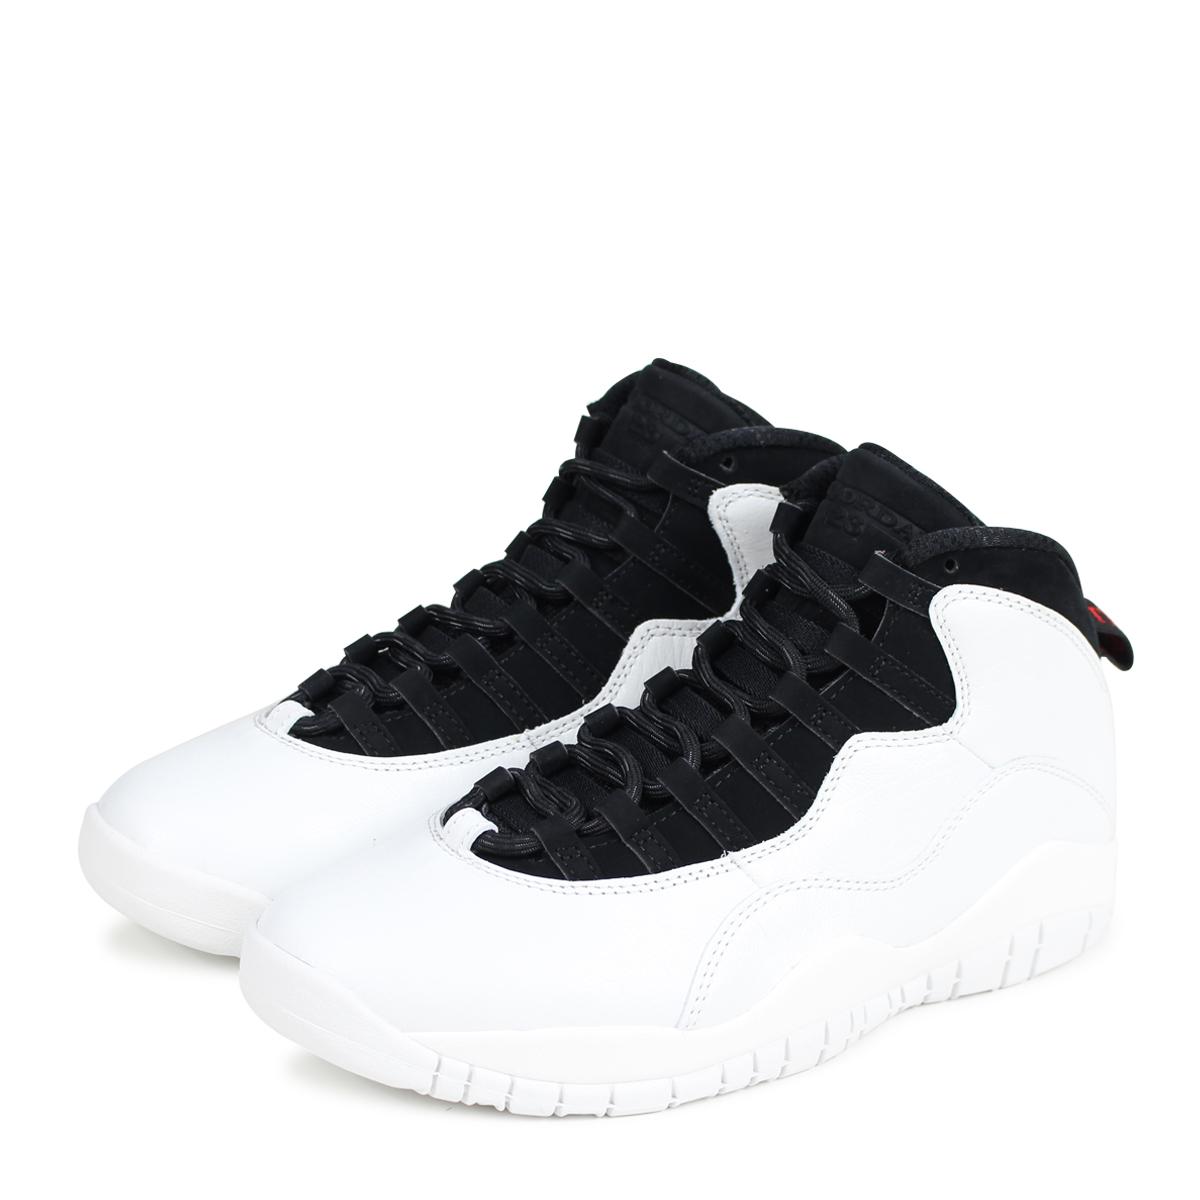 on sale 62945 b25f0 NIKE AIR JORDAN 10 RETRO I M BACK Nike Air Jordan 10 nostalgic sneakers men  310,805-104 white  3 30 Shinnyu load   183